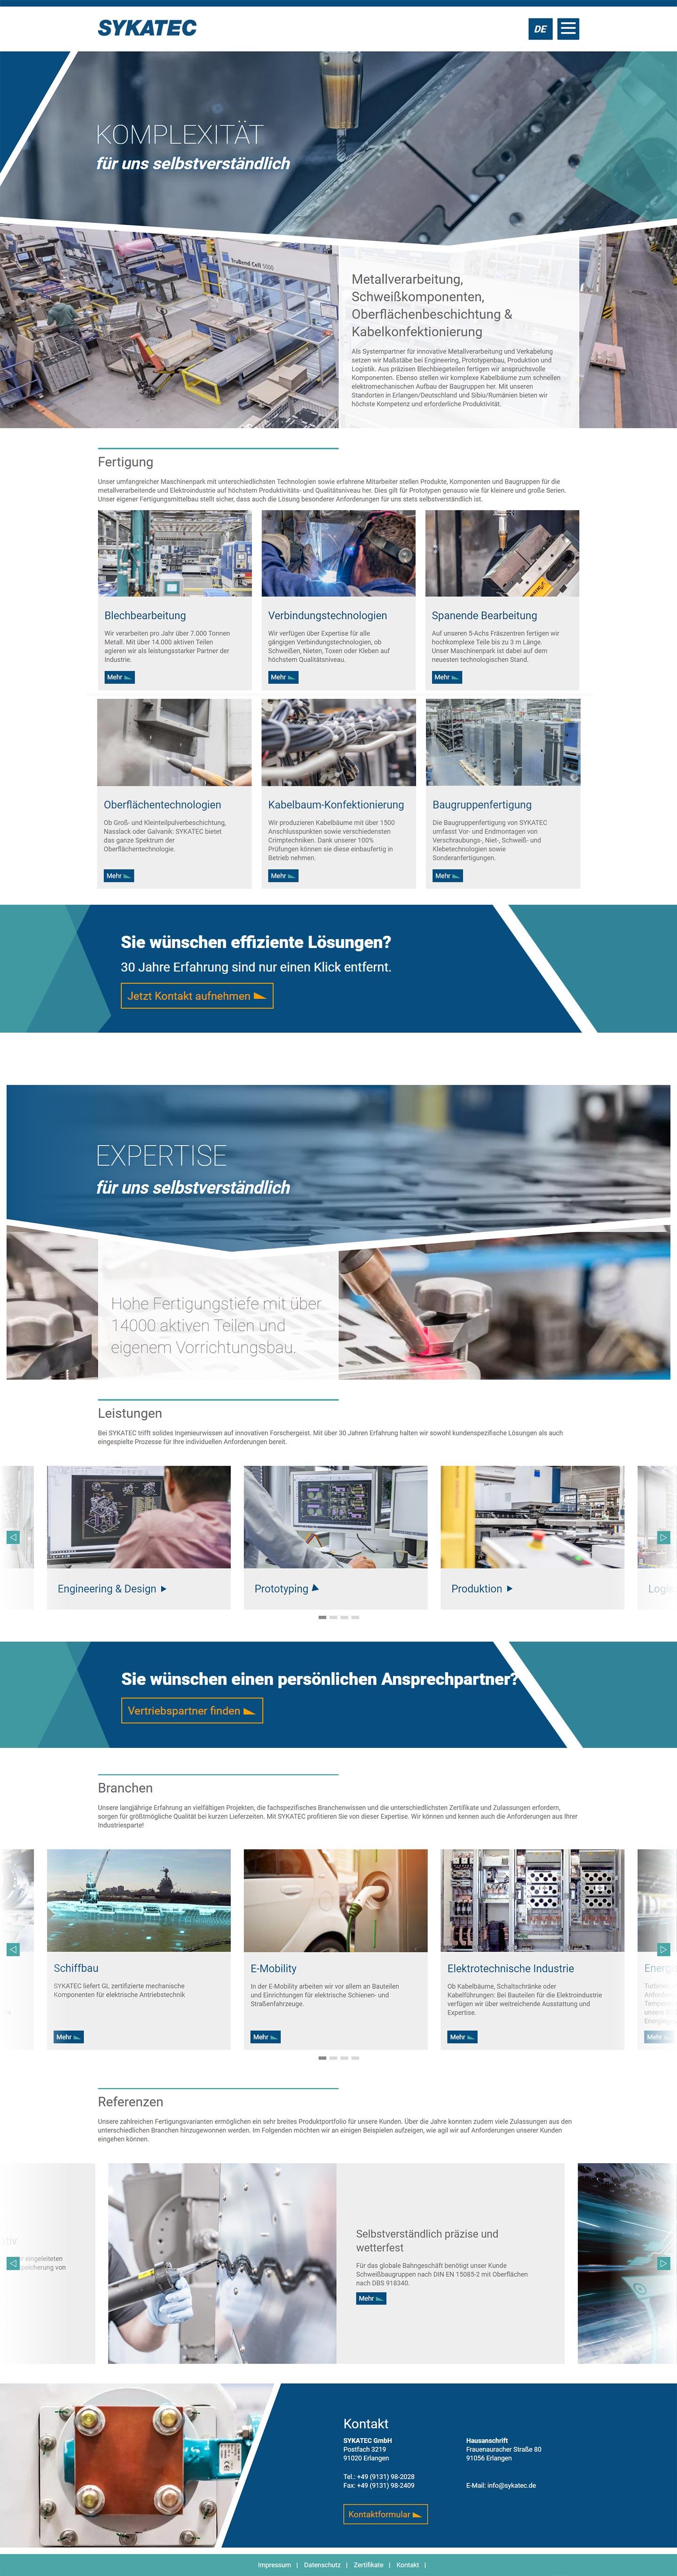 sykatec-webdesign-mobile-first-seo